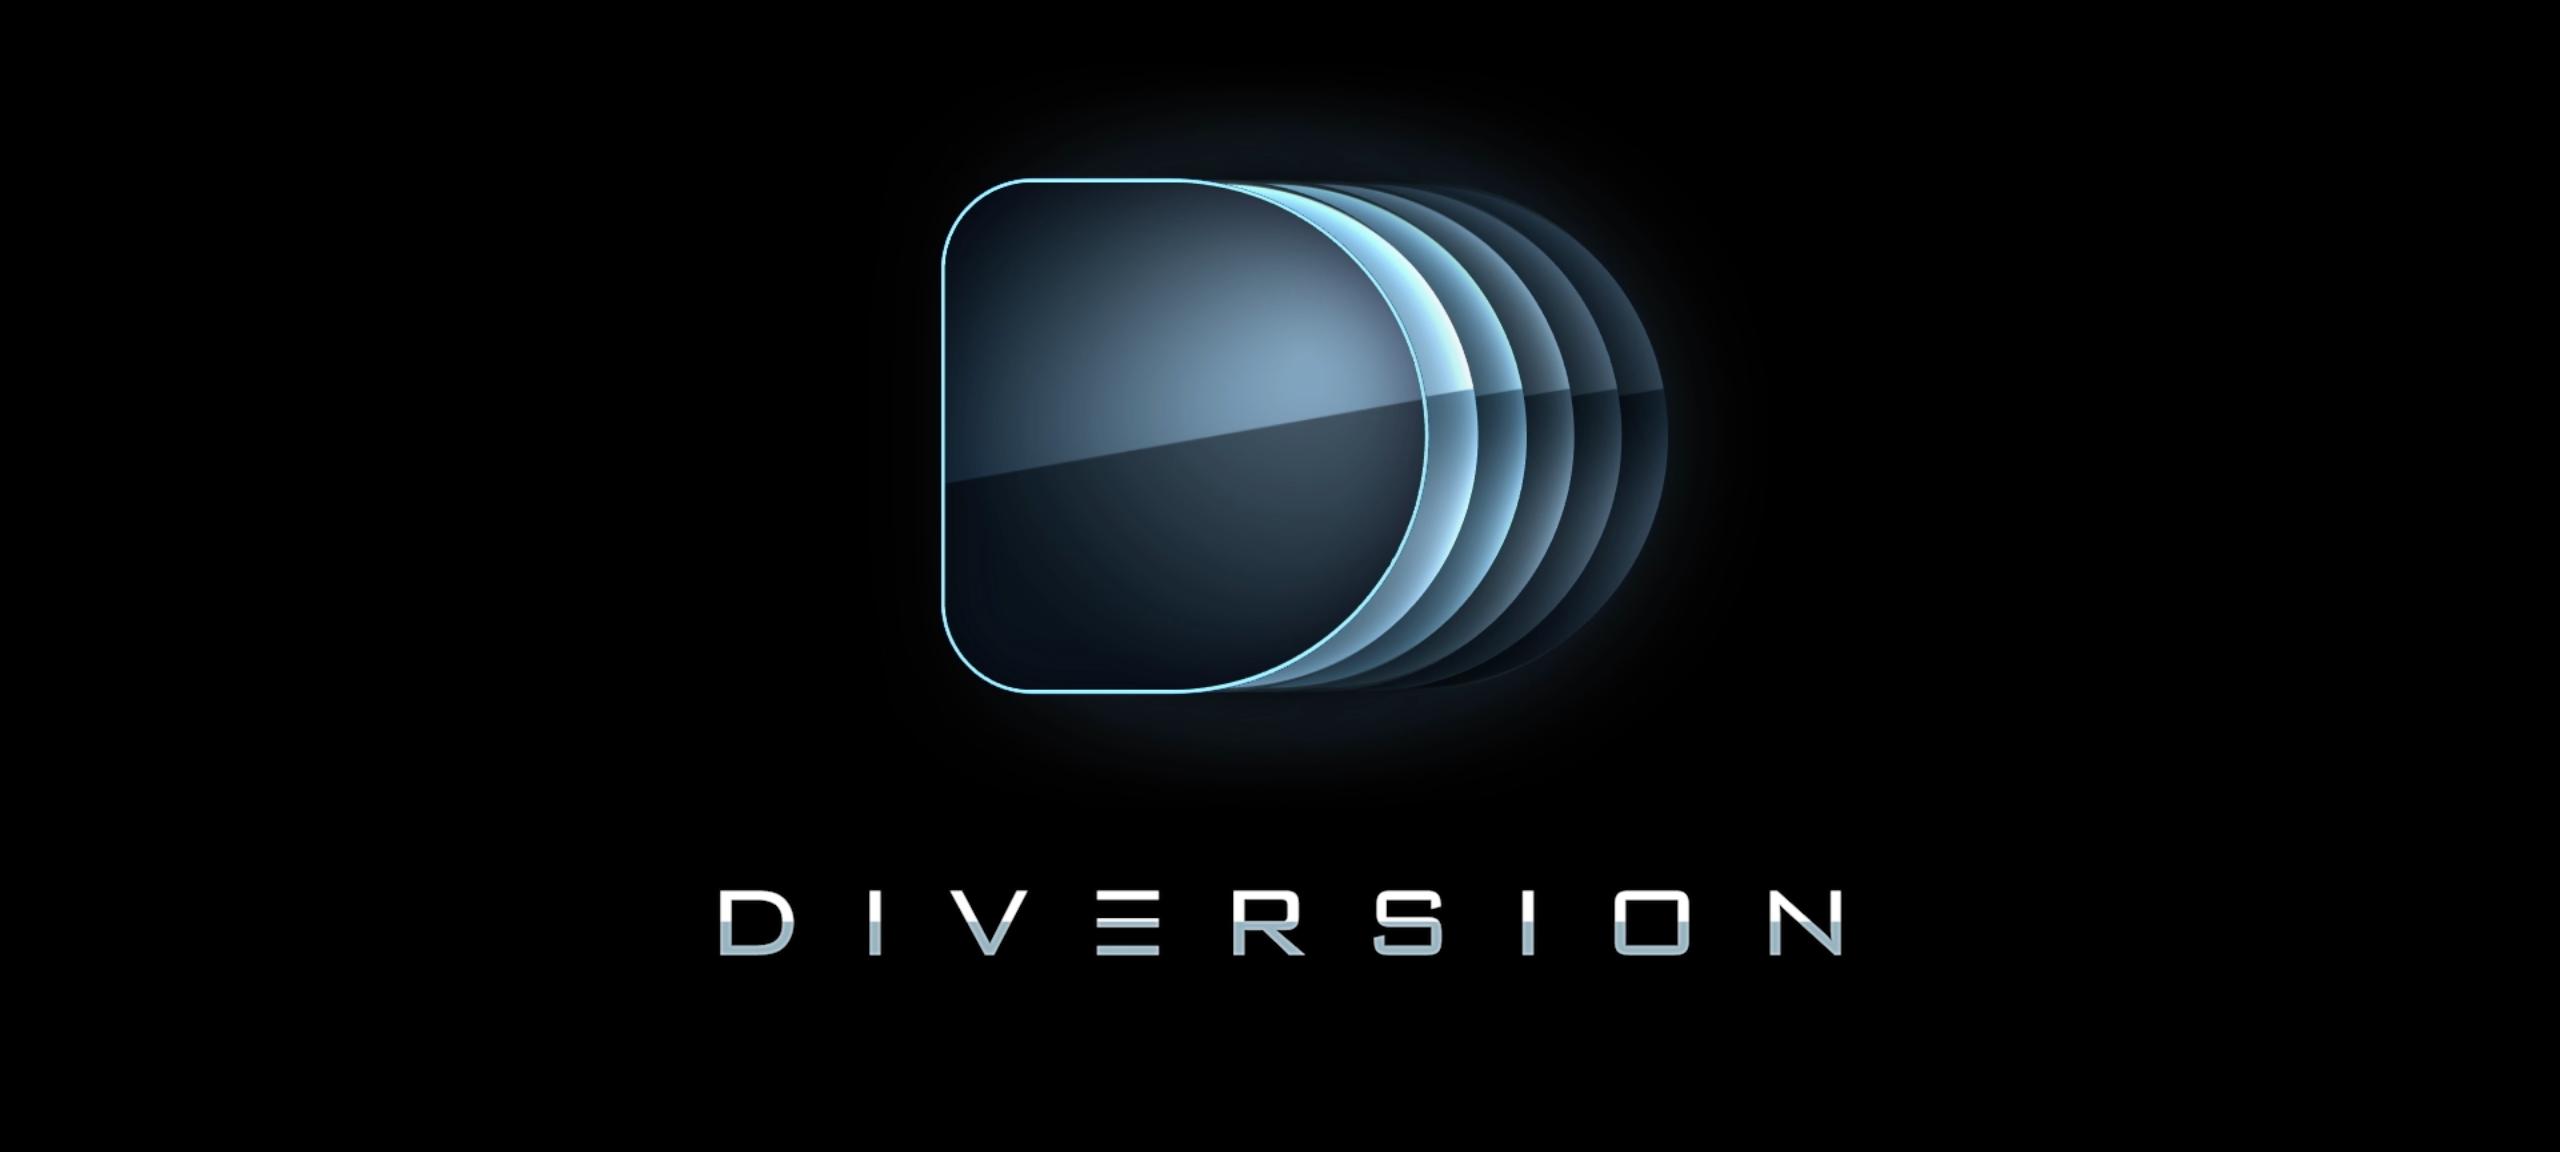 Diversion tf1